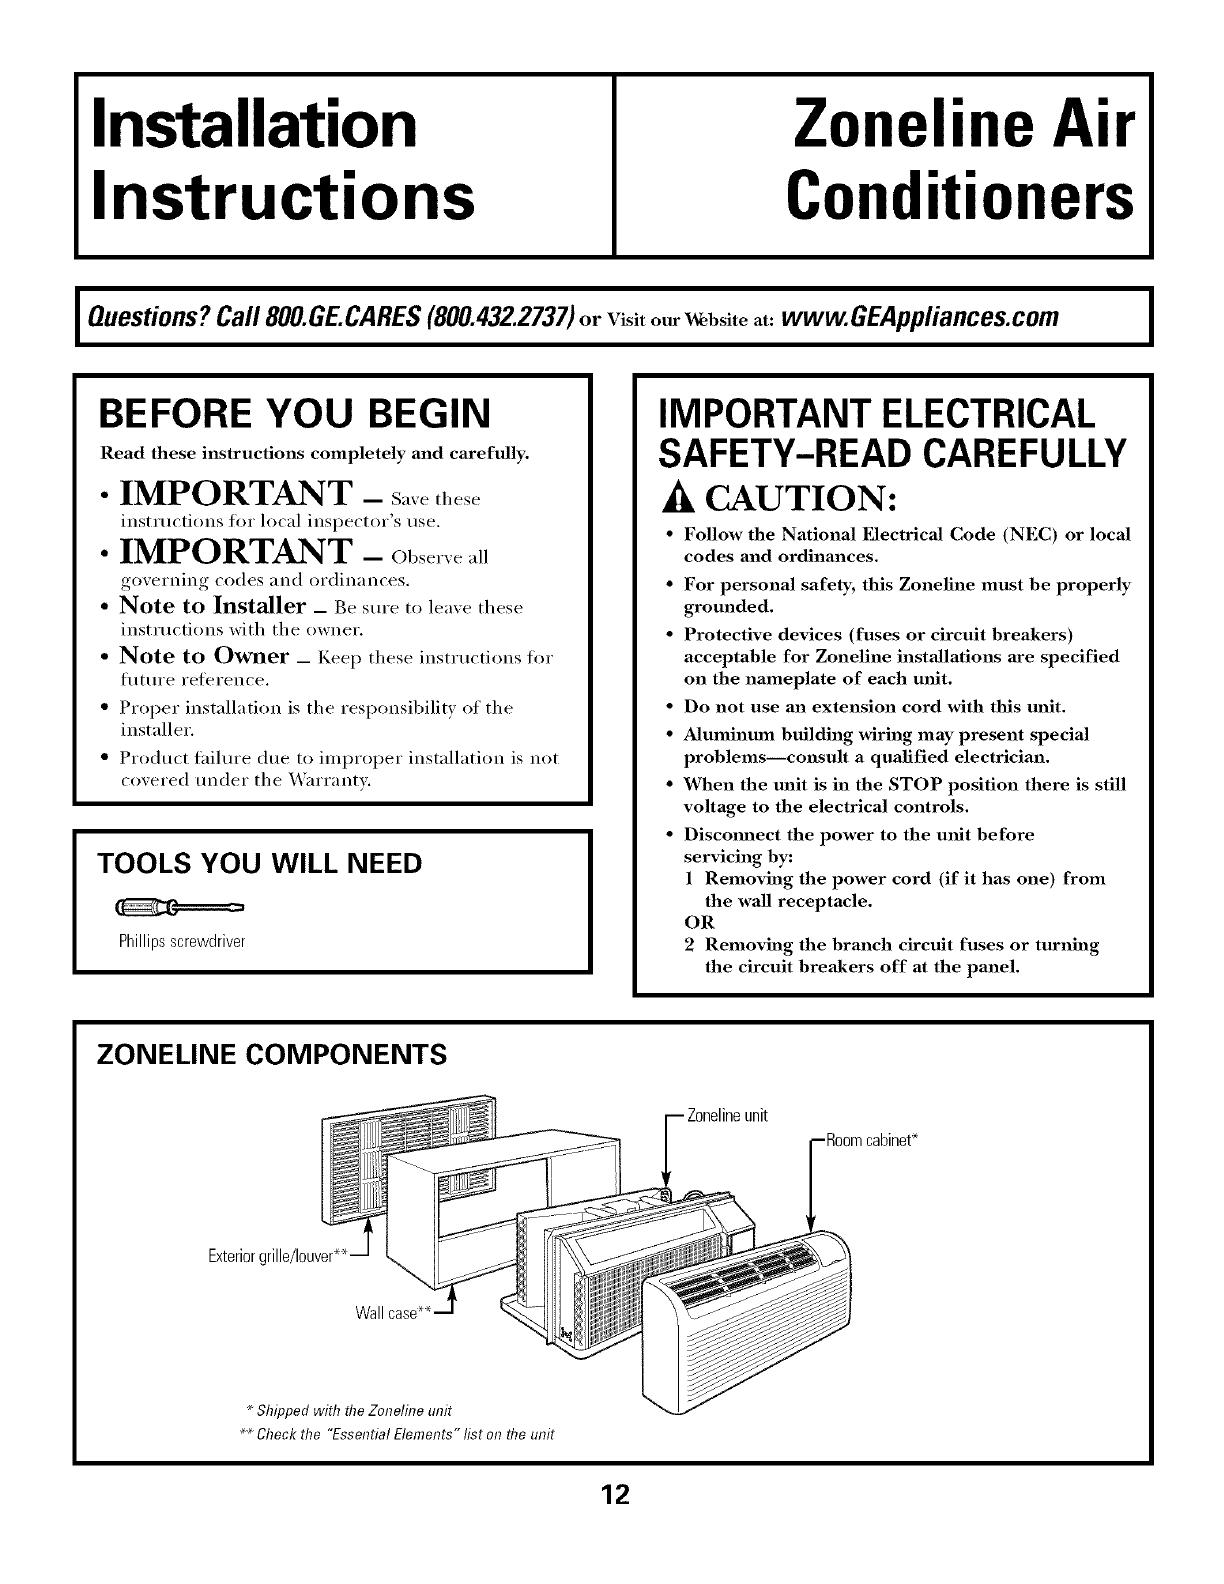 general electric zoneline manual